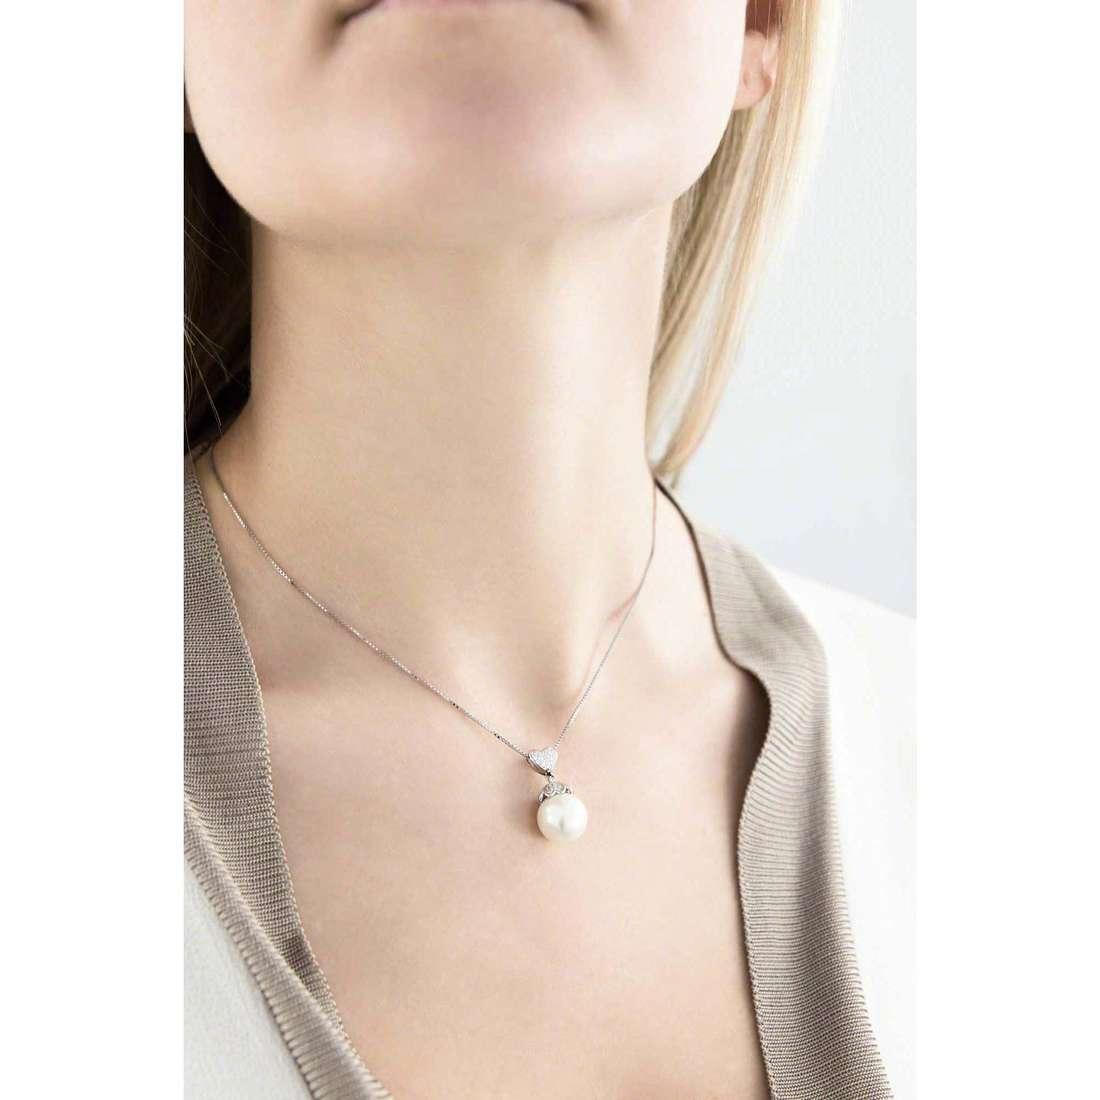 GioiaPura colliers femme 37932-01-00 indosso